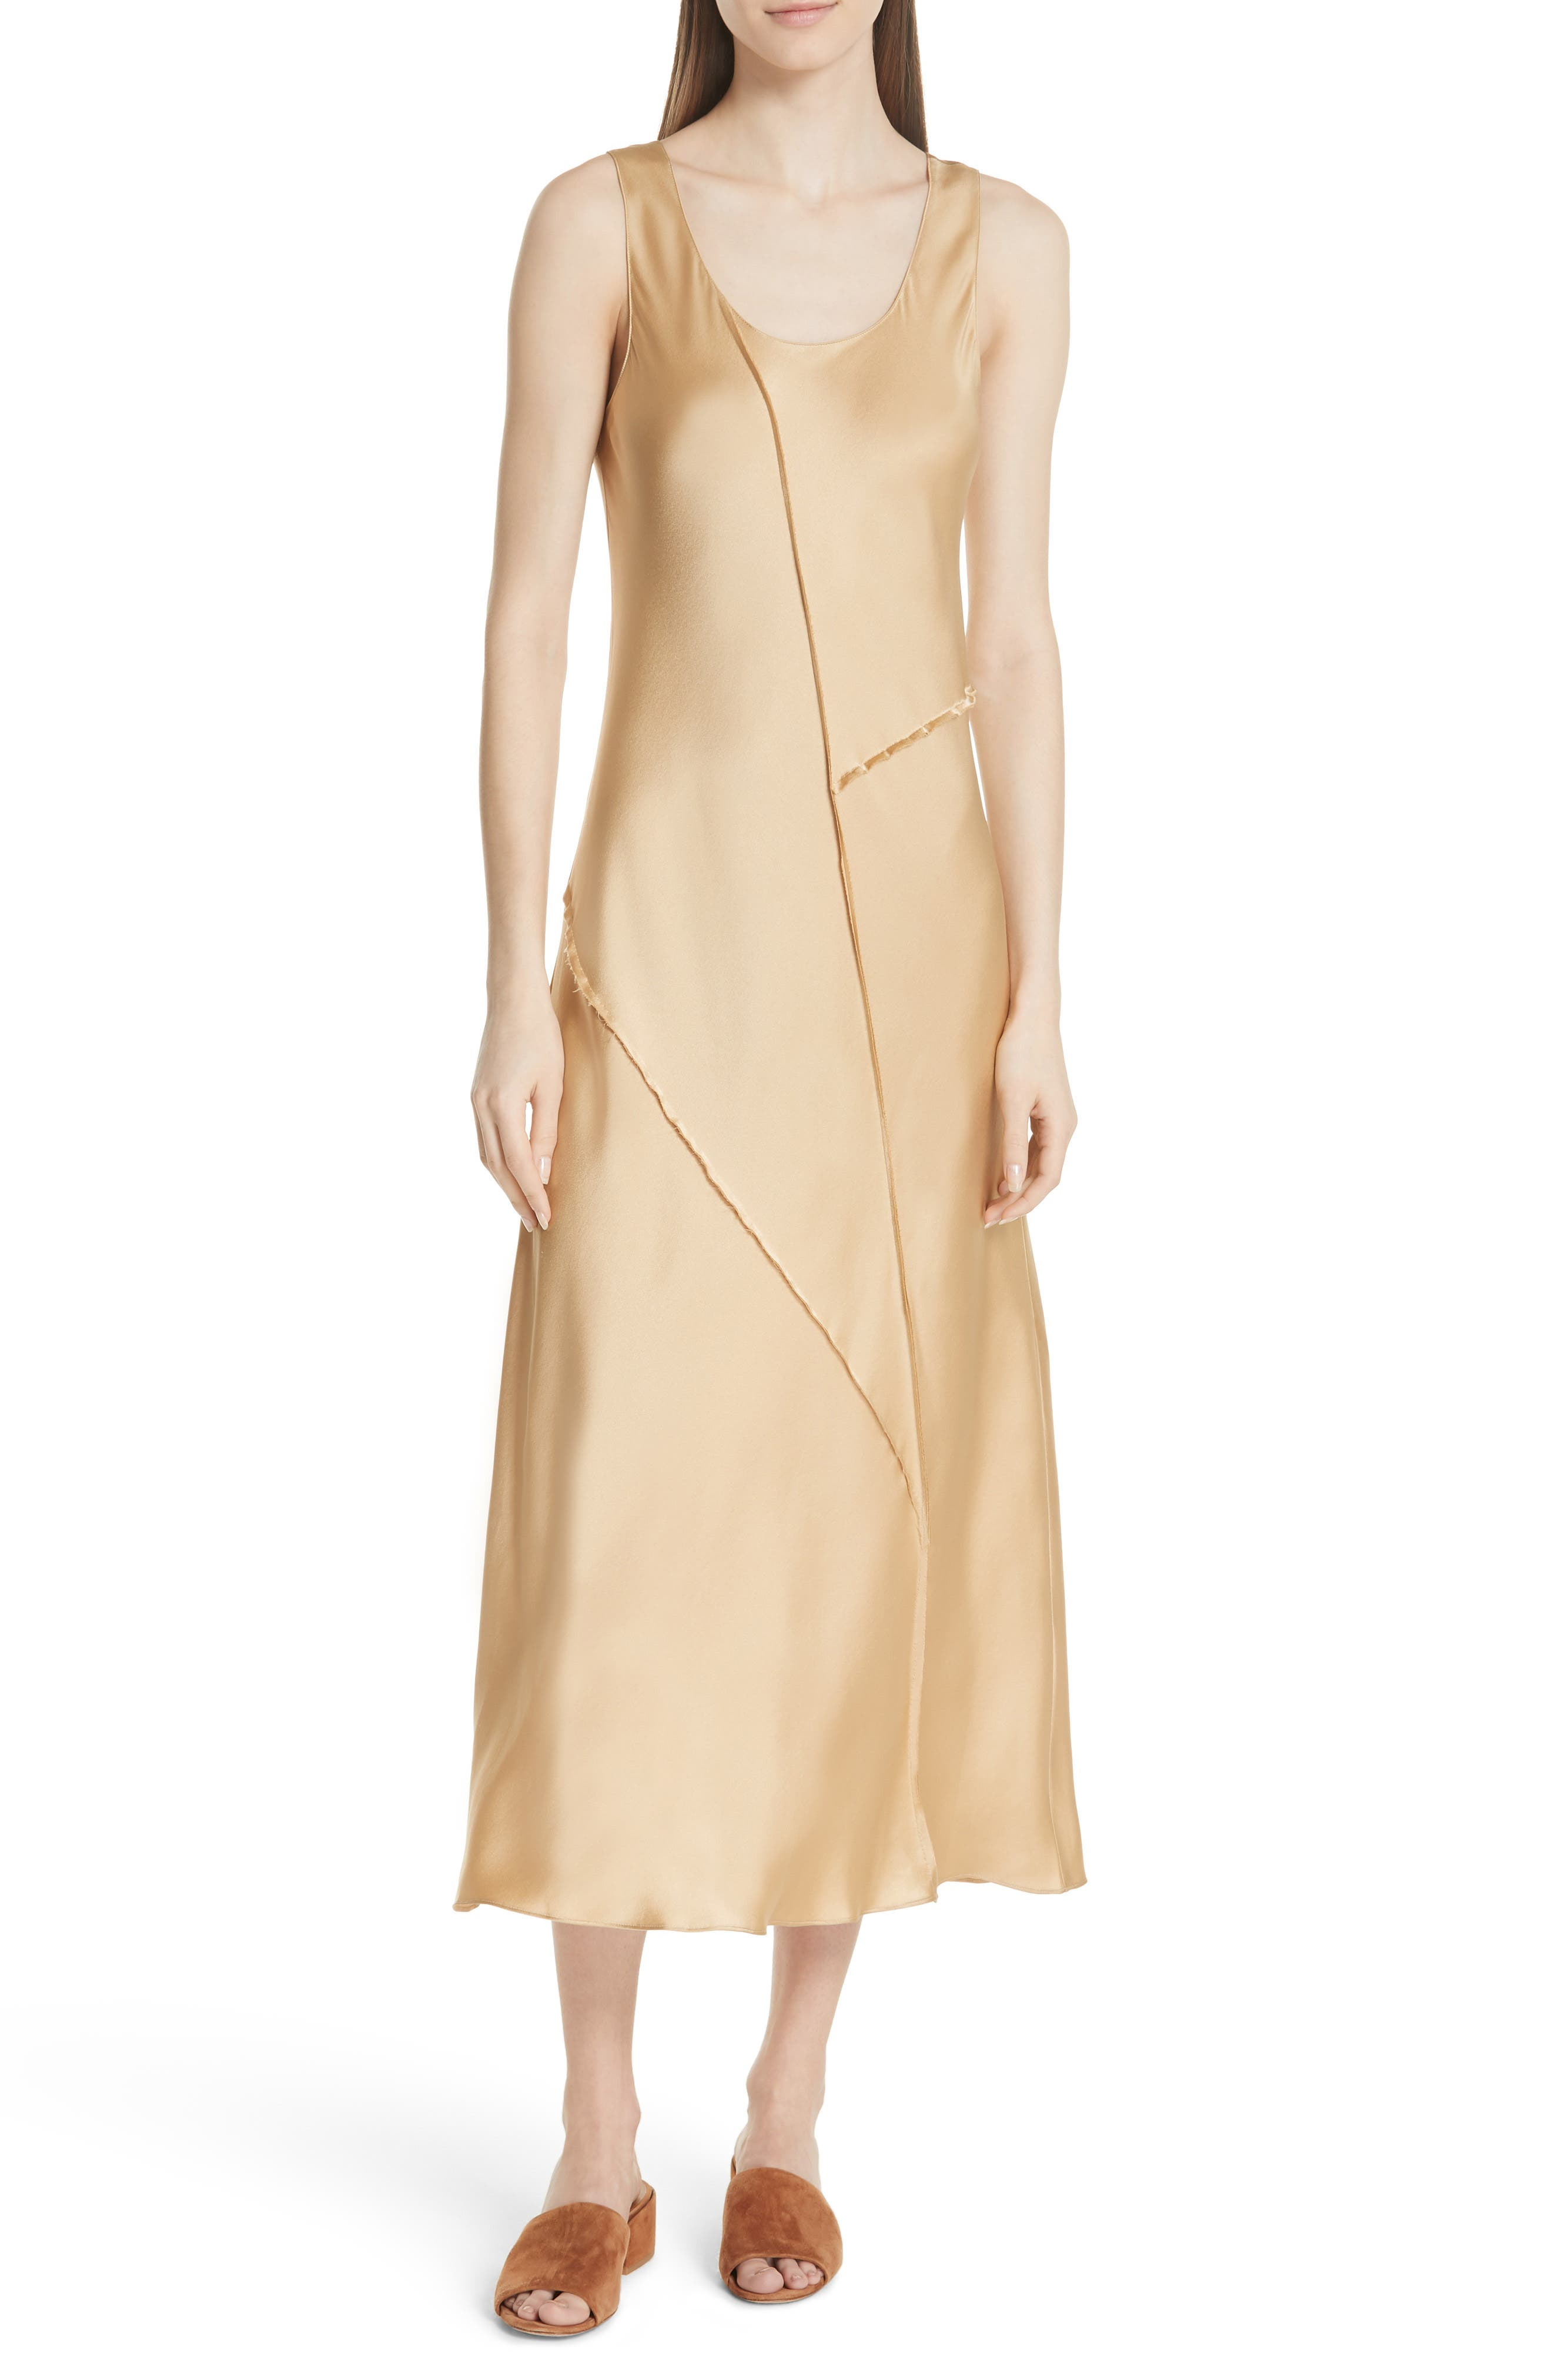 Silk Tank Dress by Vince